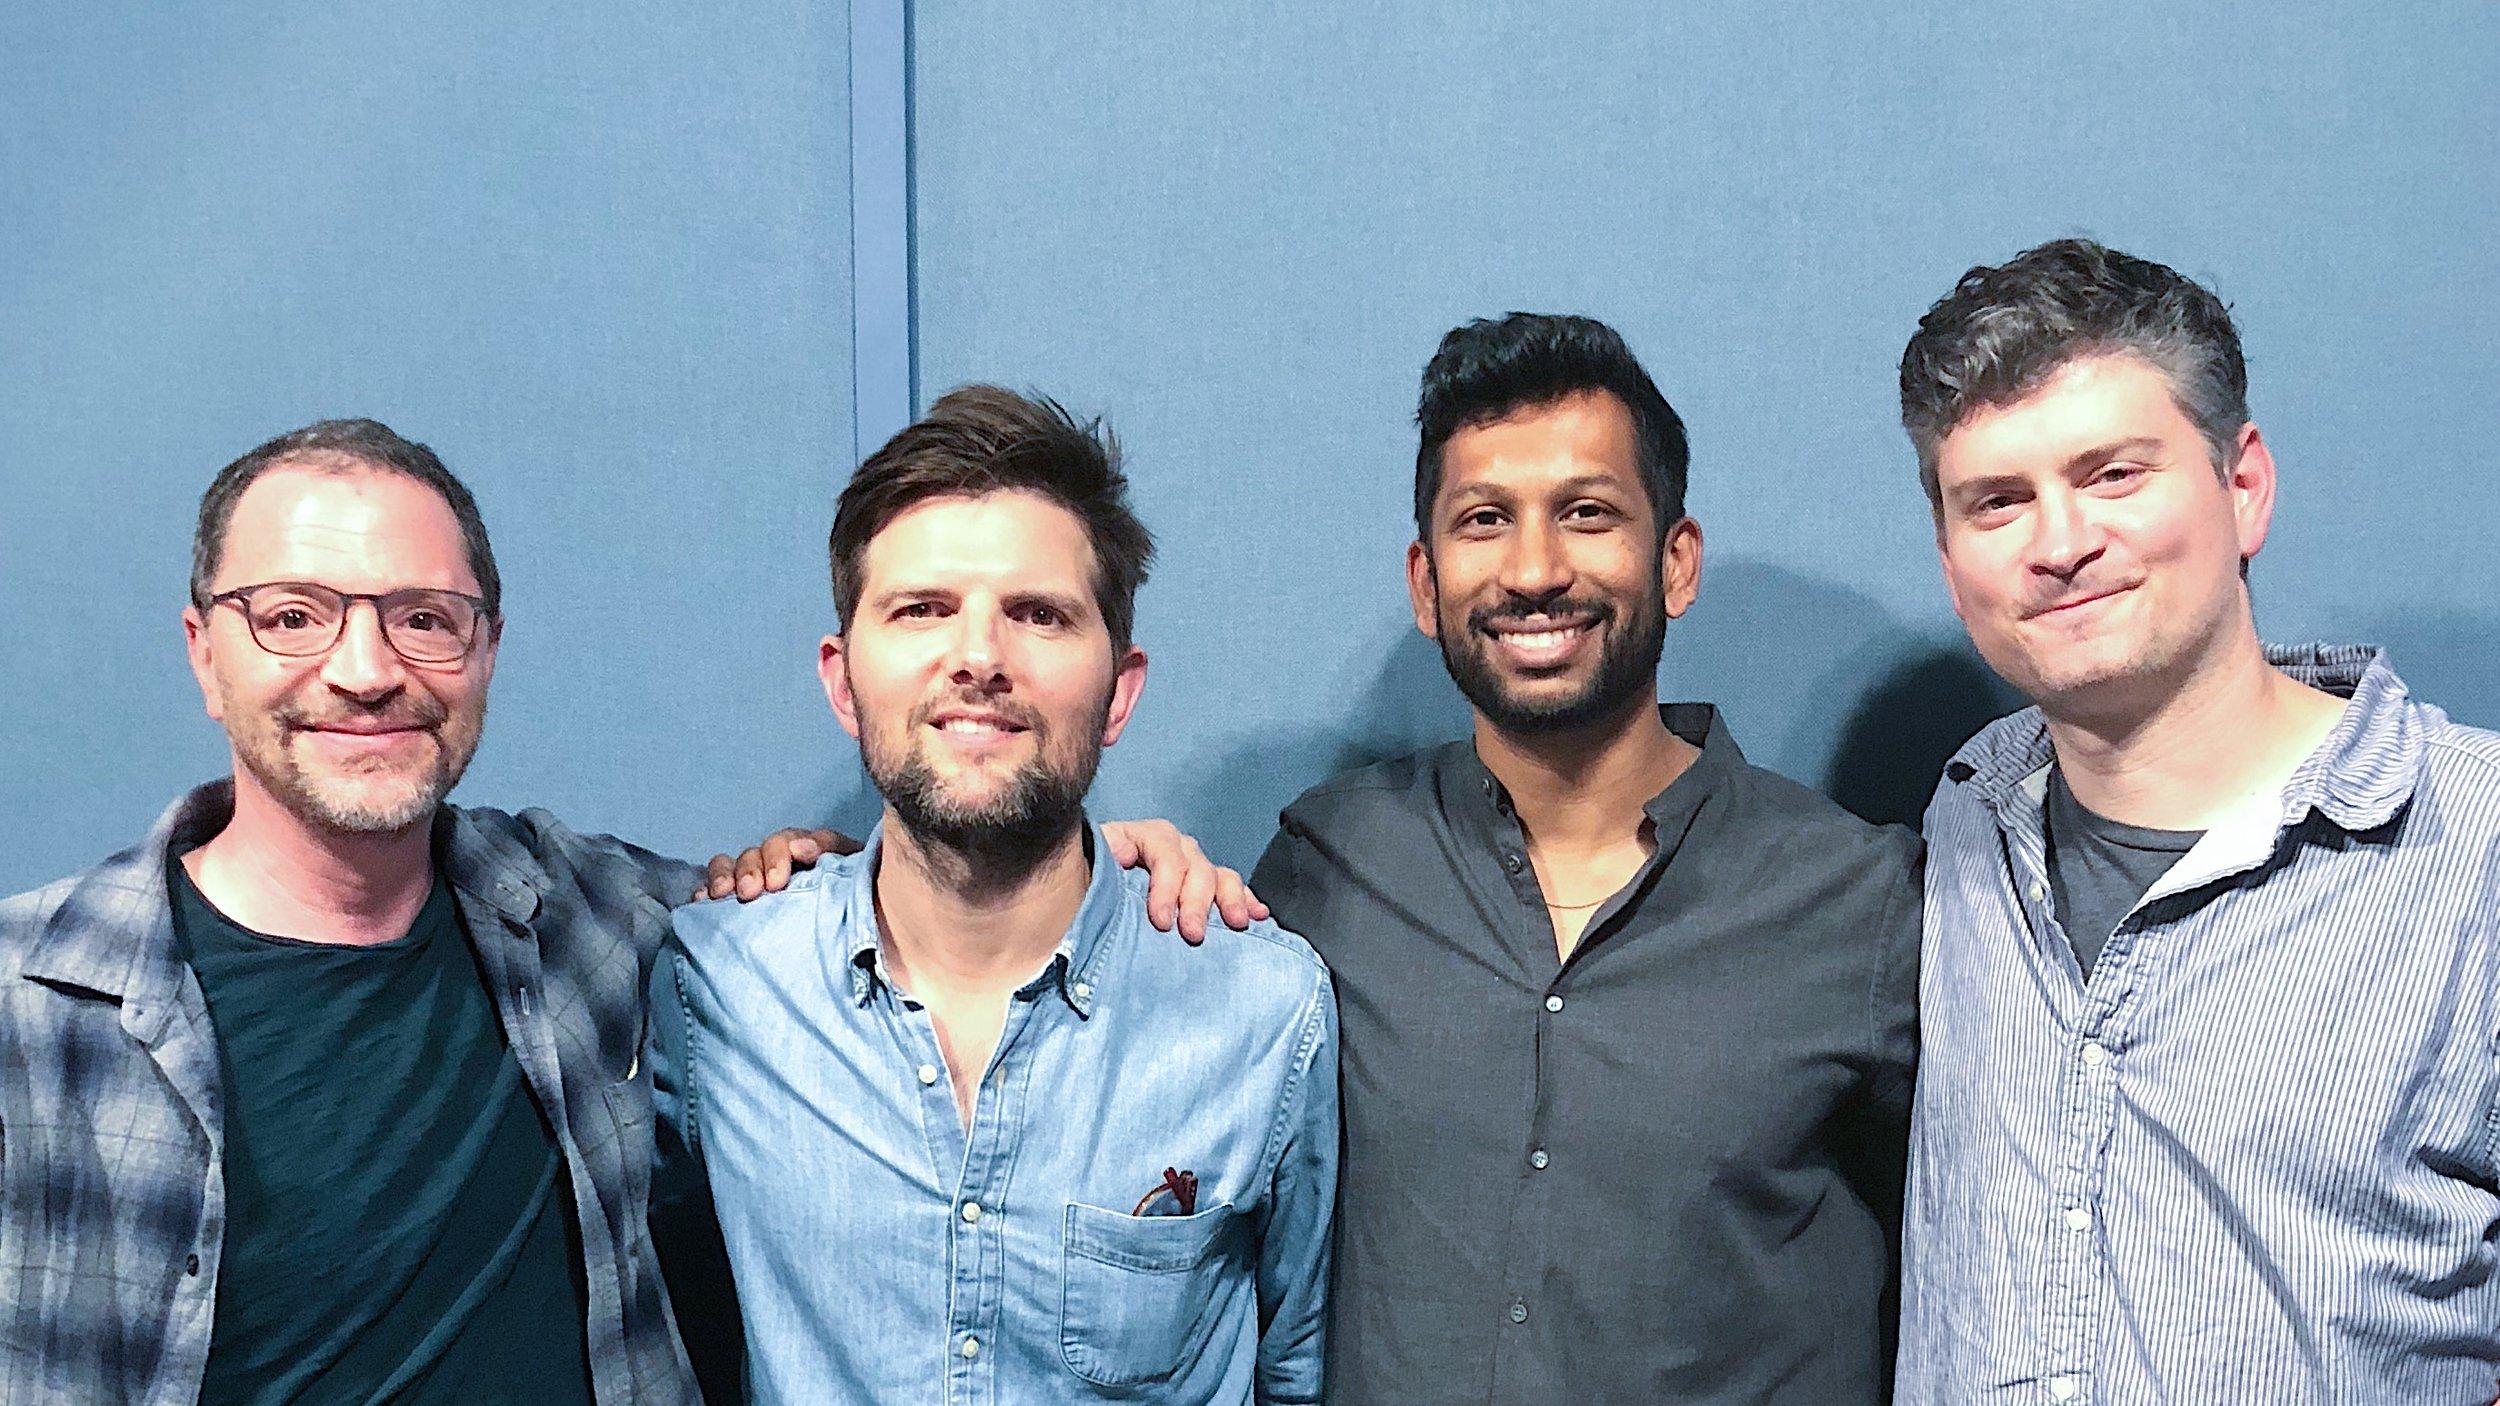 Josh, Adam Scott, Hrishi and Michael Schur